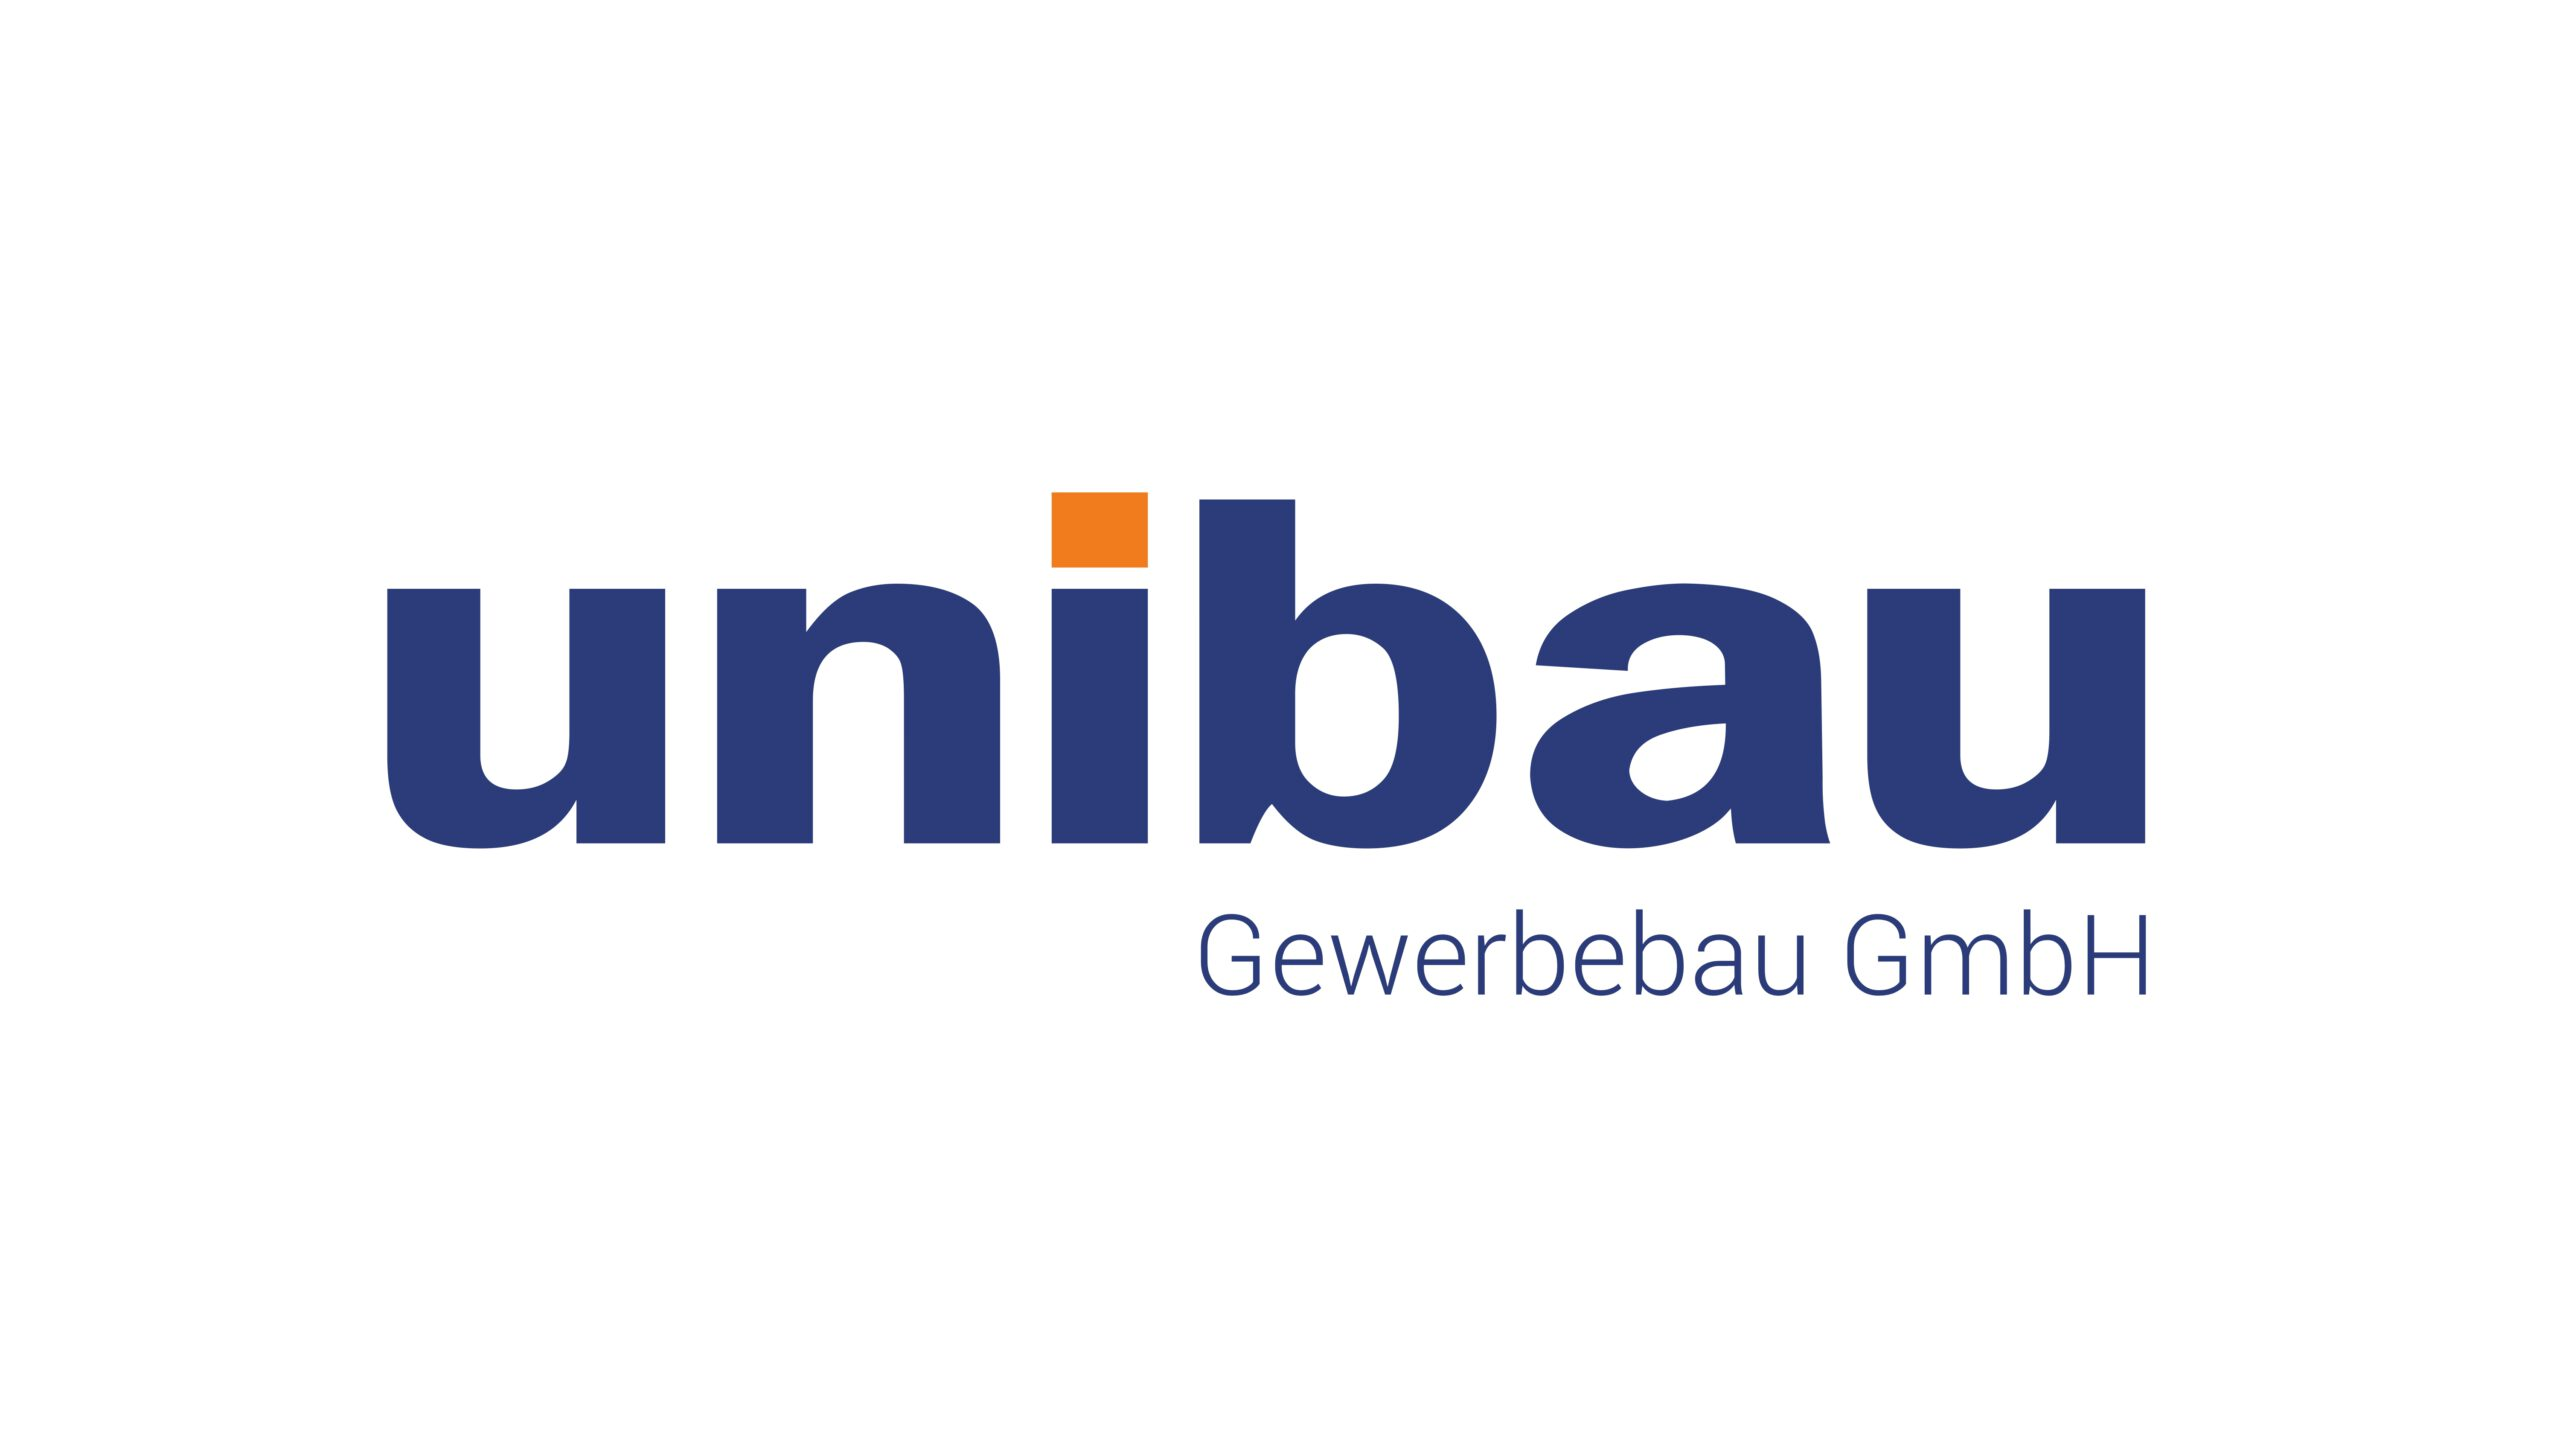 https://www.unibaugewerbebau.de/de